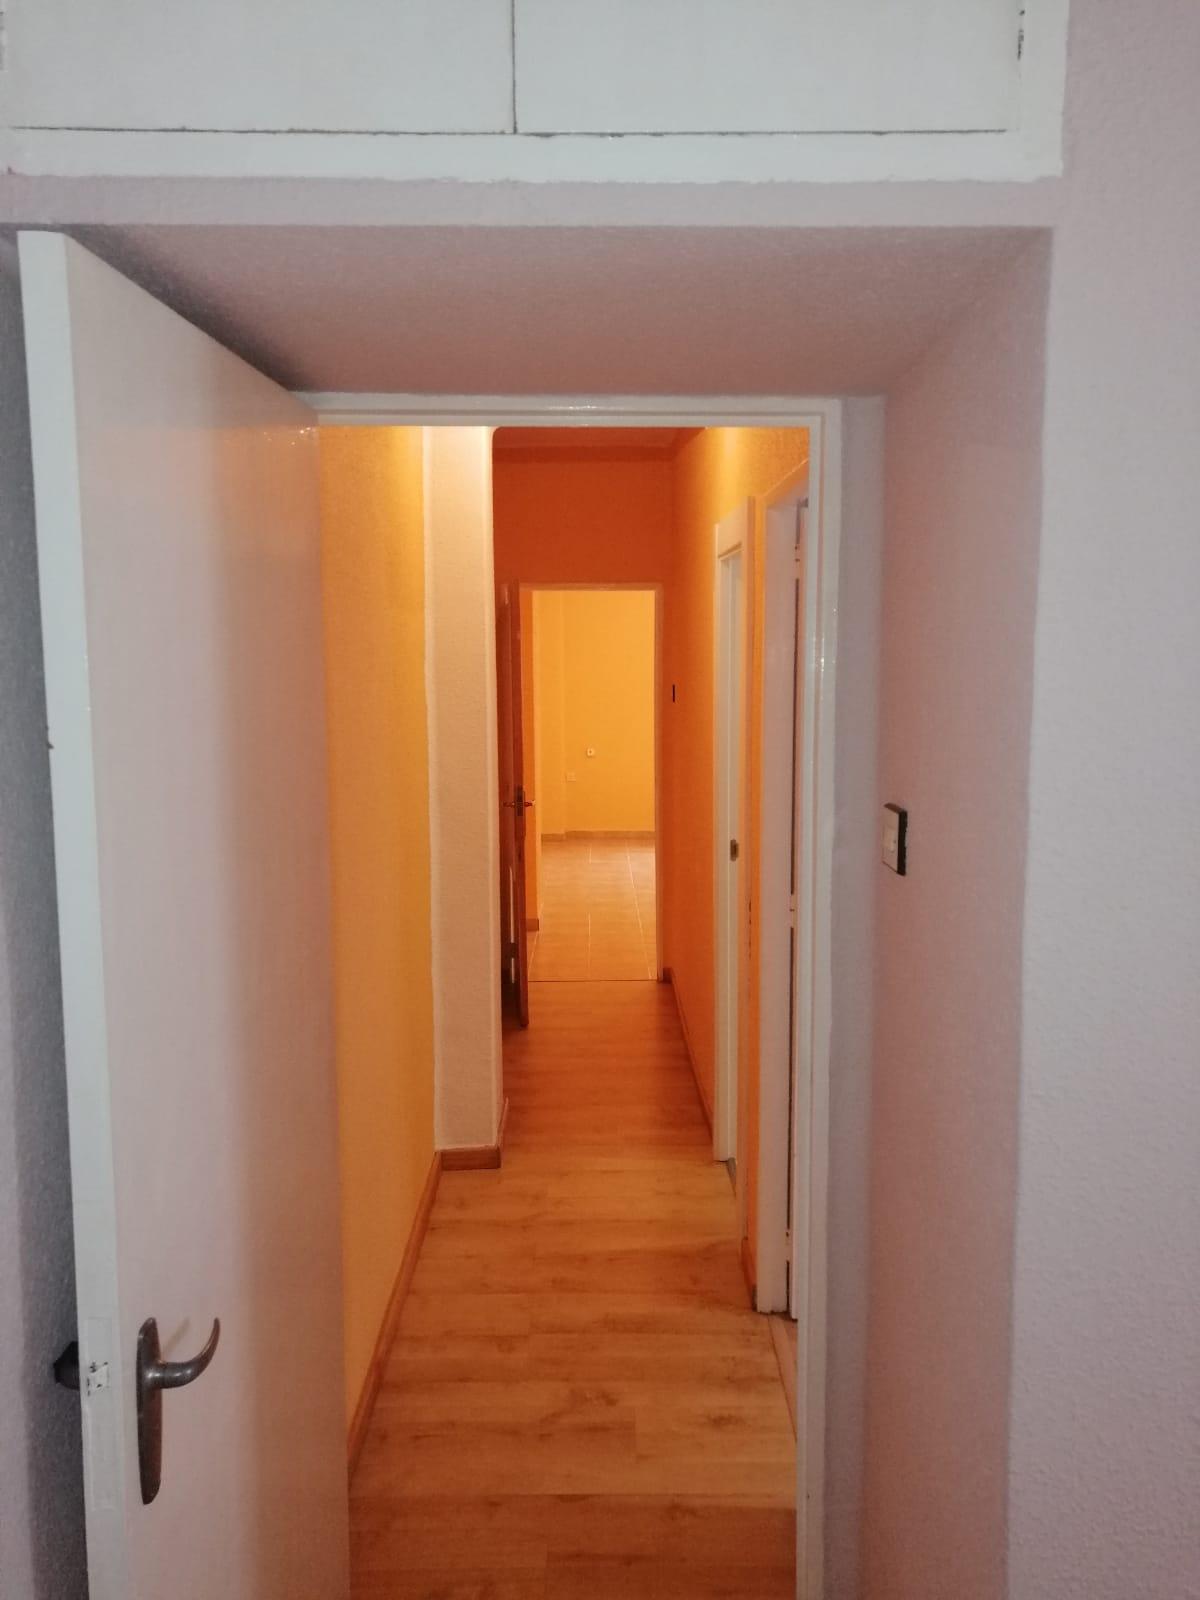 Piso de tres dormitorios junto a corte inglés (REF: 53) - foto 21 44d89df2-7639-41fb-afe4-bc92484ca7dc.jpg